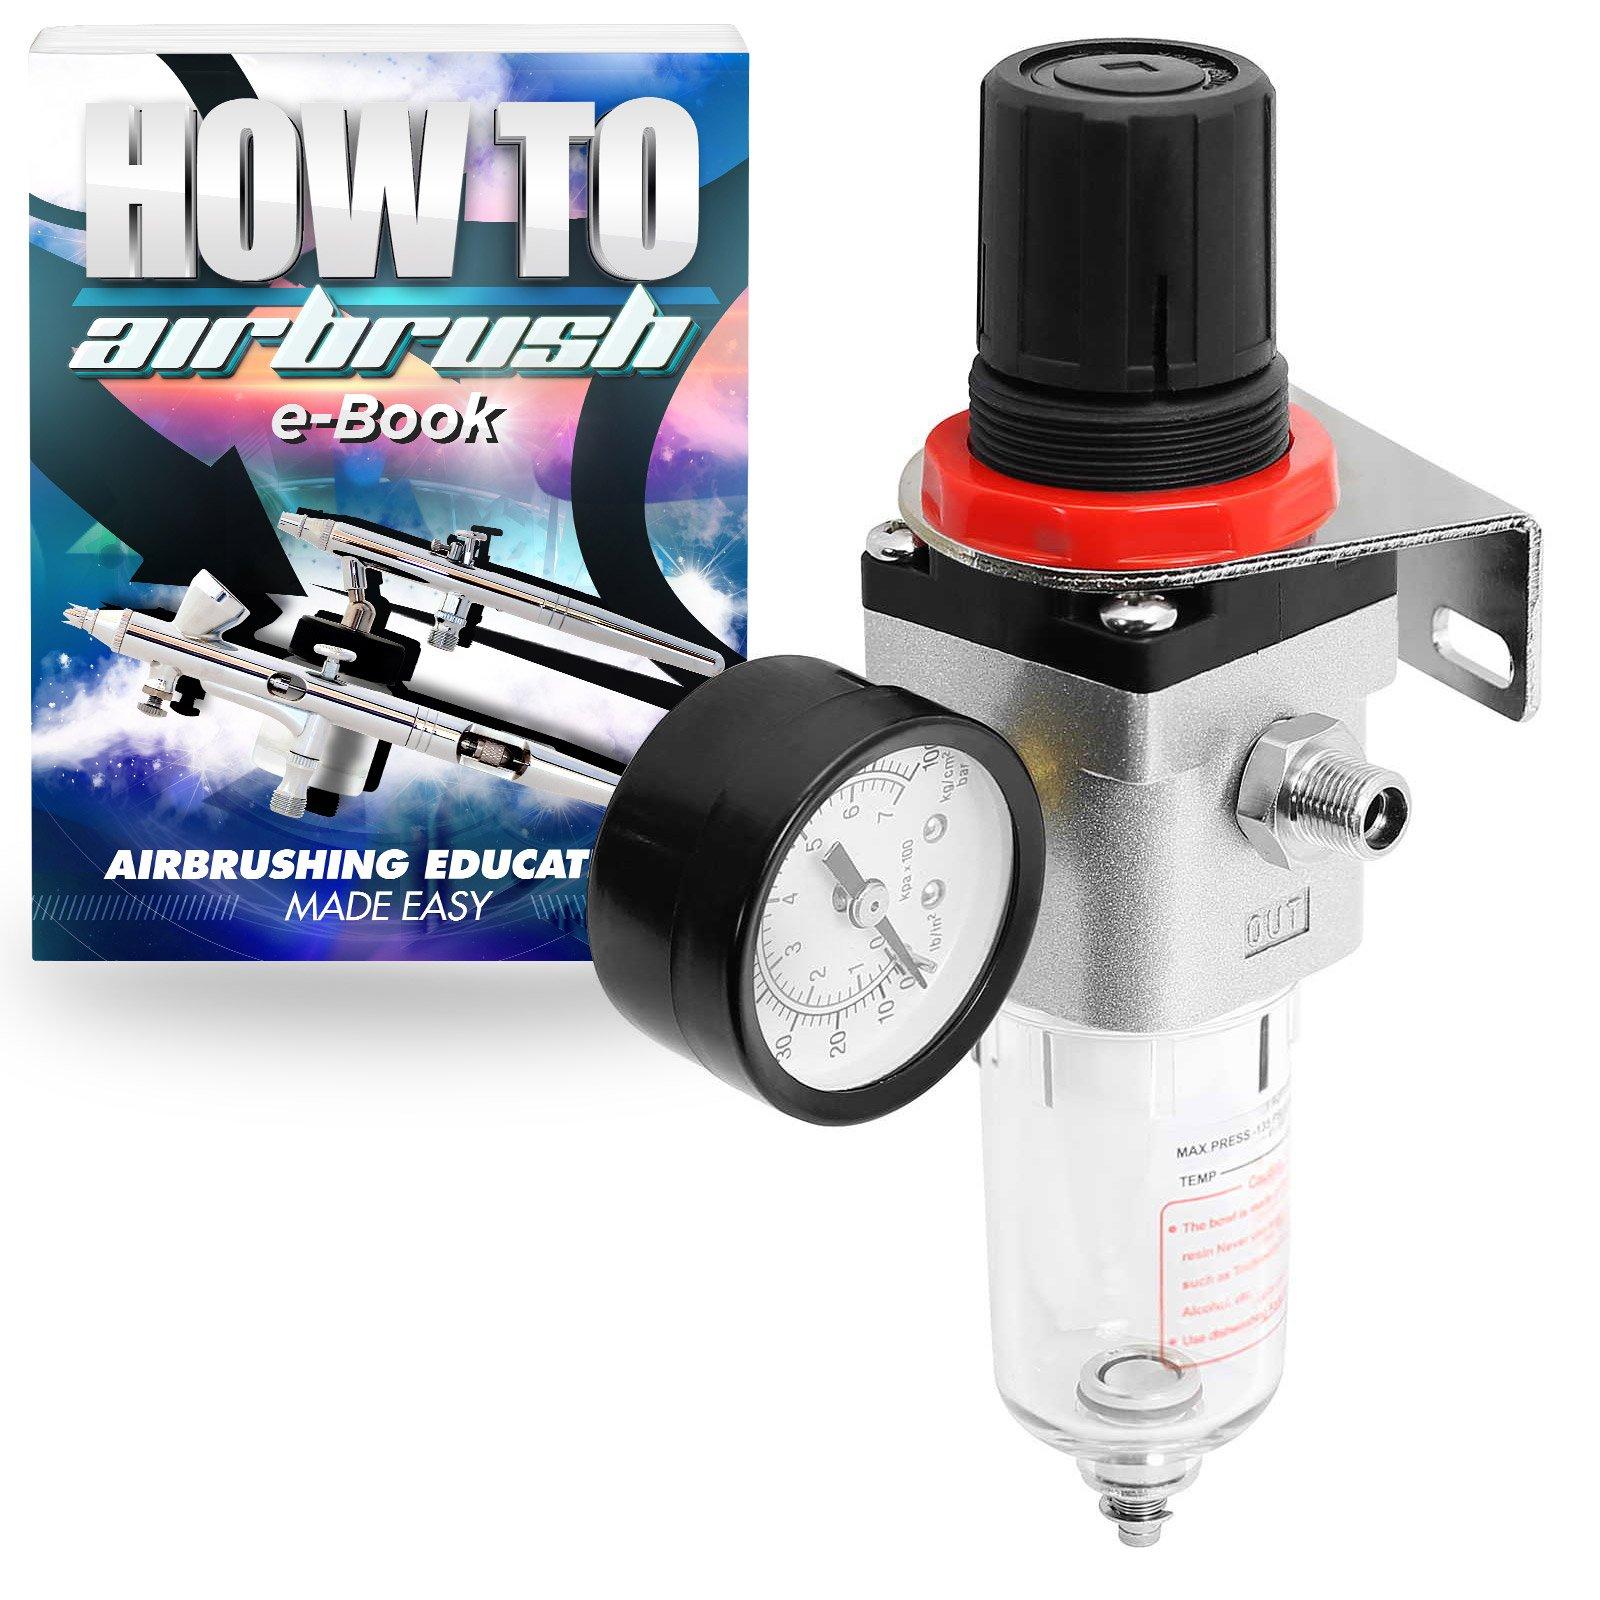 Airbrush Air Compressor Regulator with Moisture Trap Air